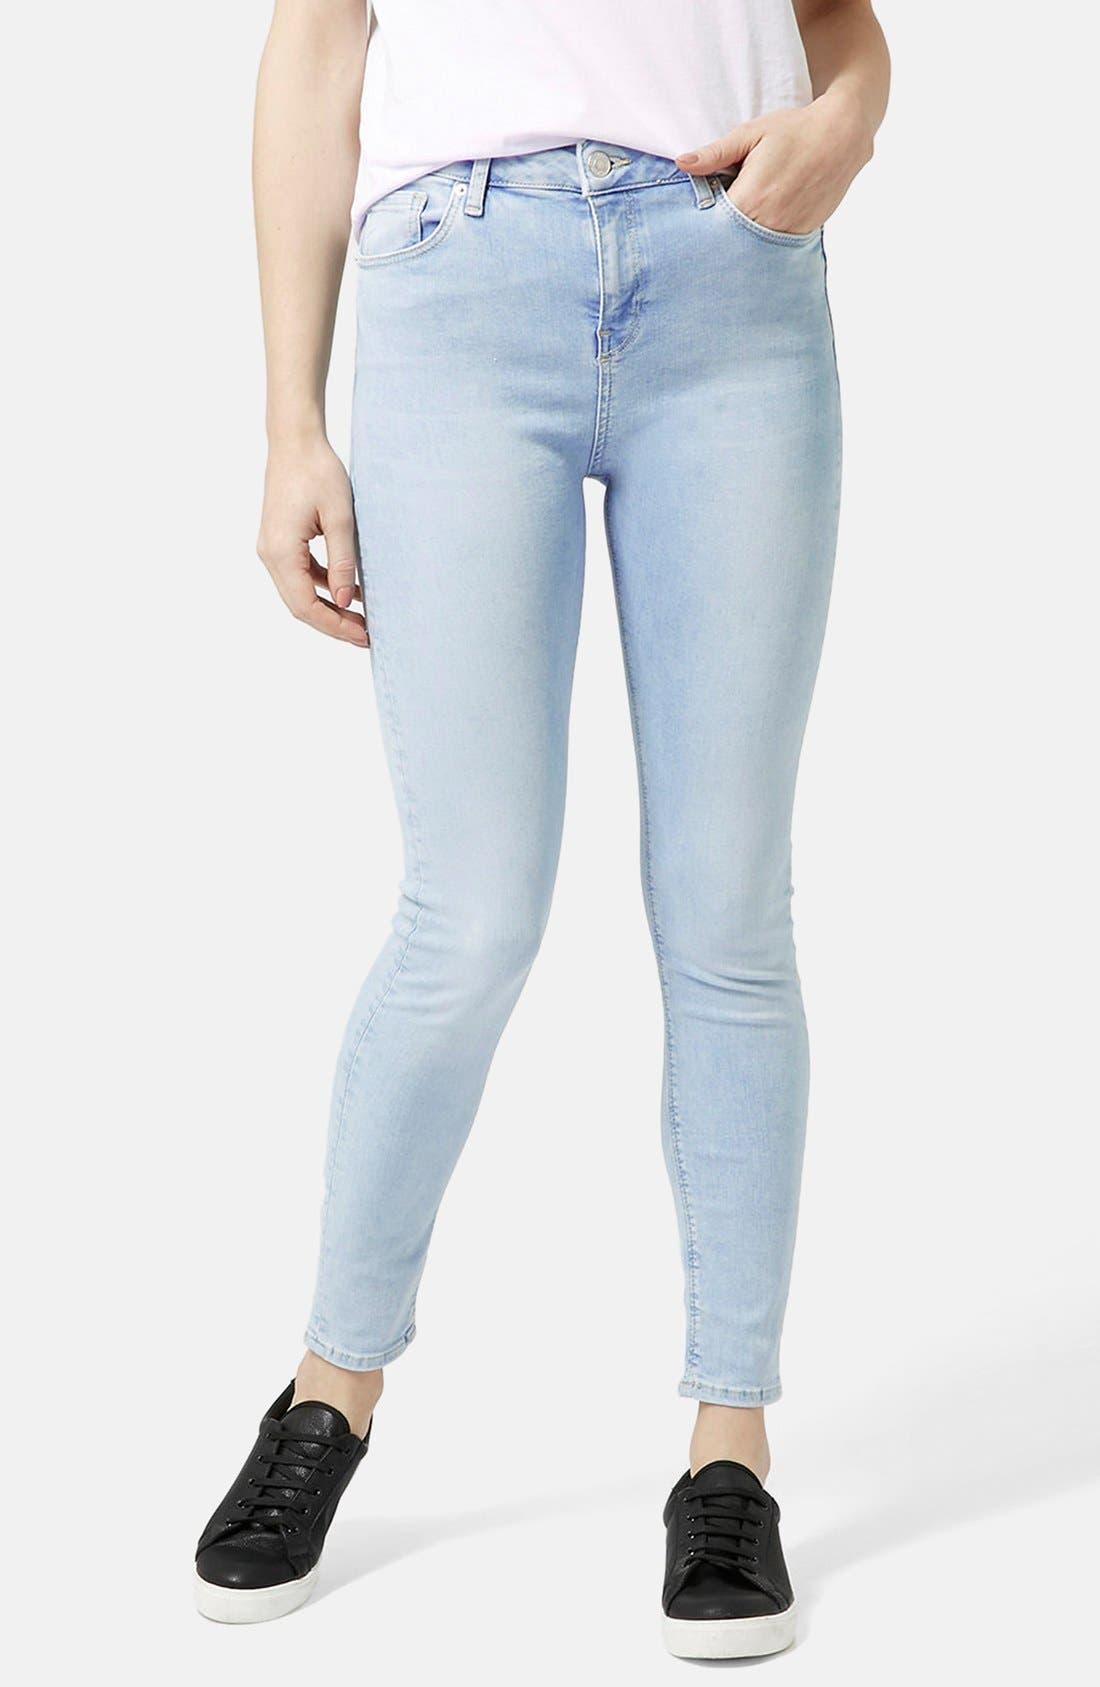 Alternate Image 1 Selected - Topshop Moto 'Jamie' Bleached Skinny Jeans (Light Denim) (Regular & Short)